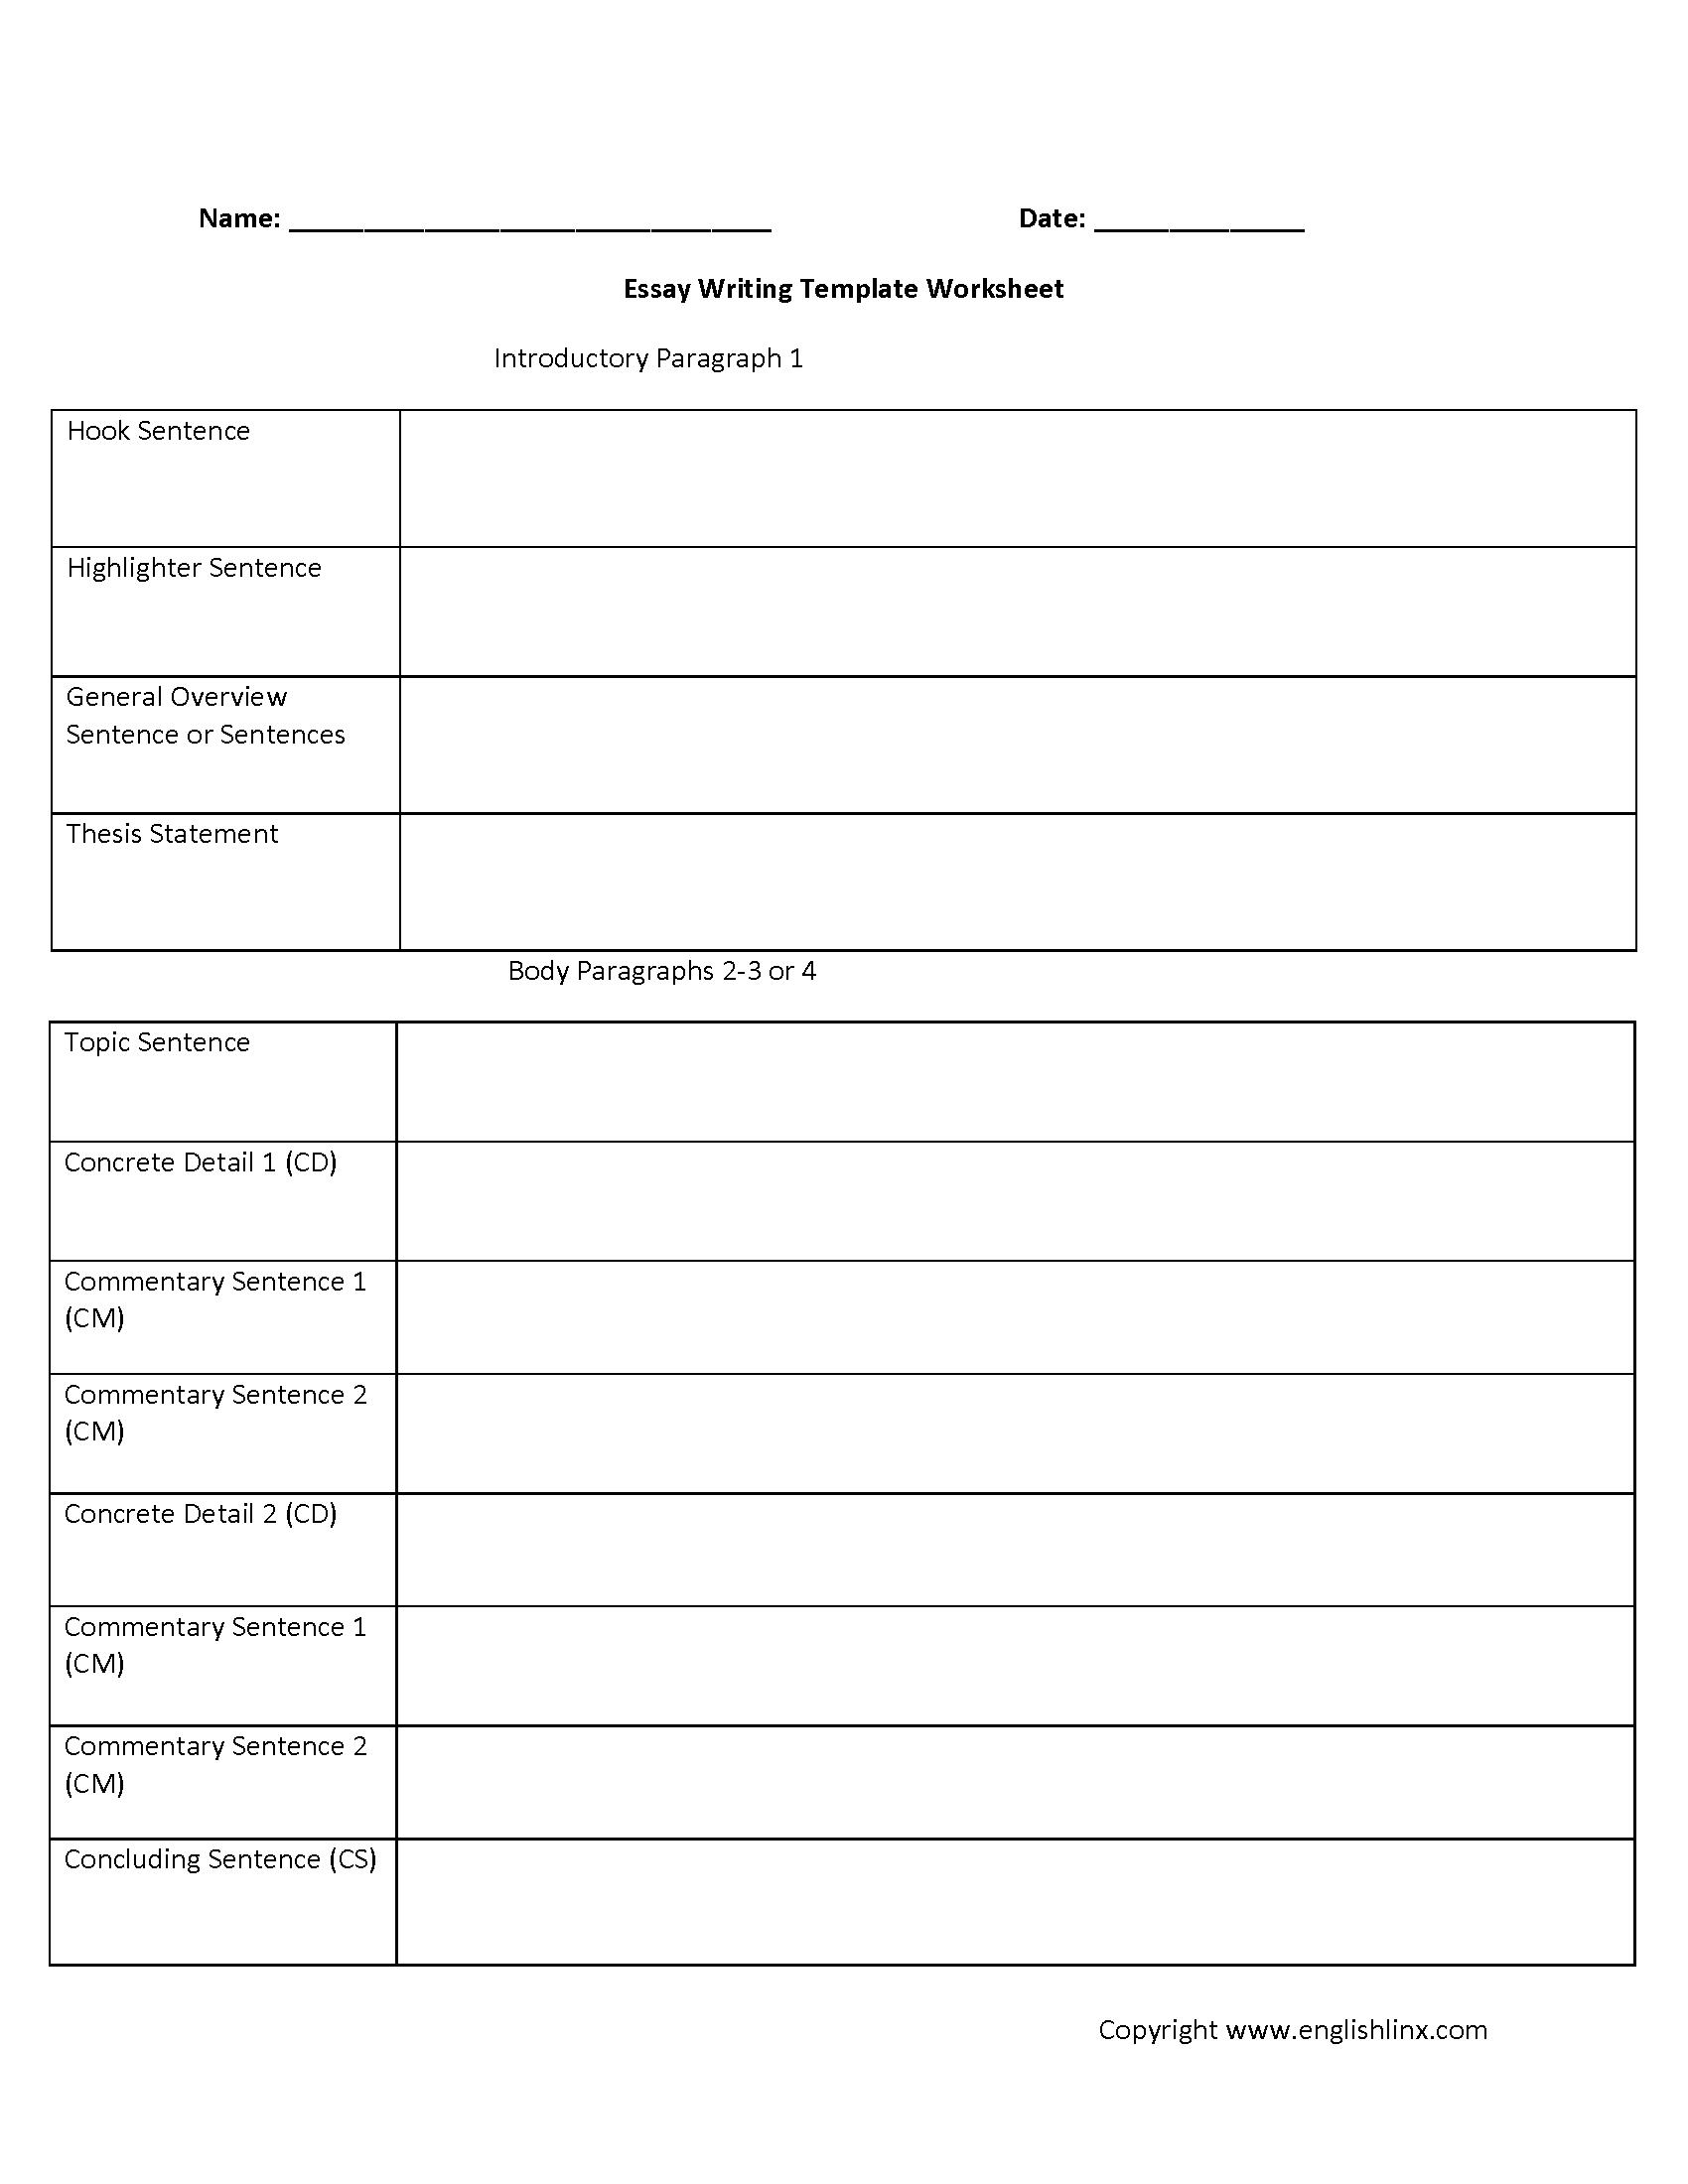 Essay Writing Template Worksheet